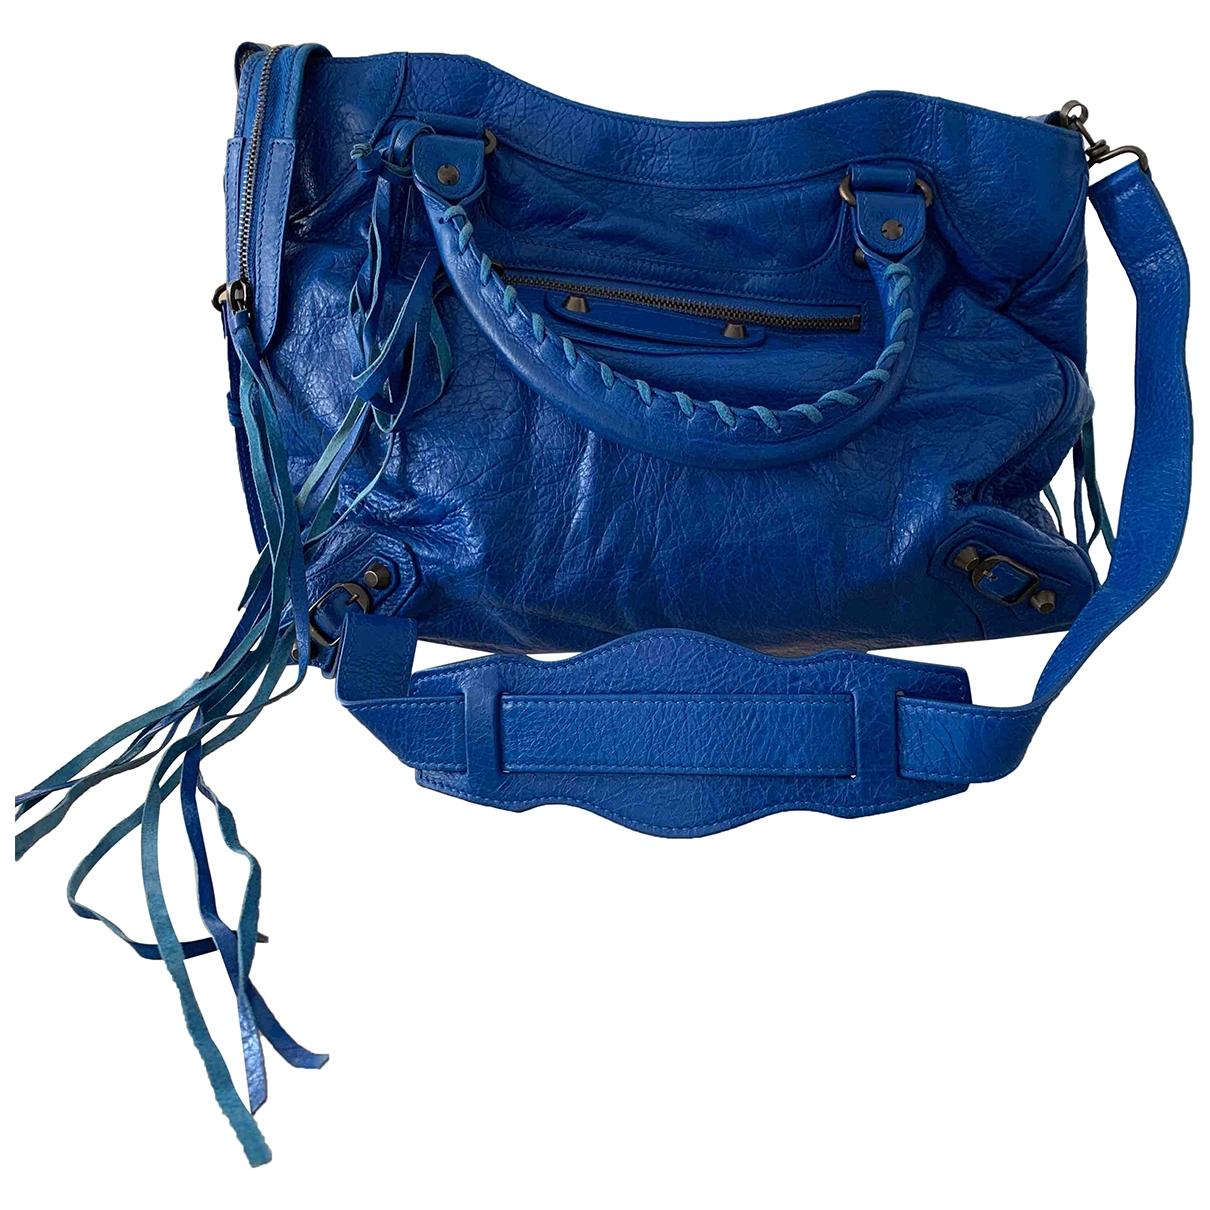 Balenciaga Work Blue Leather handbag for Women \N